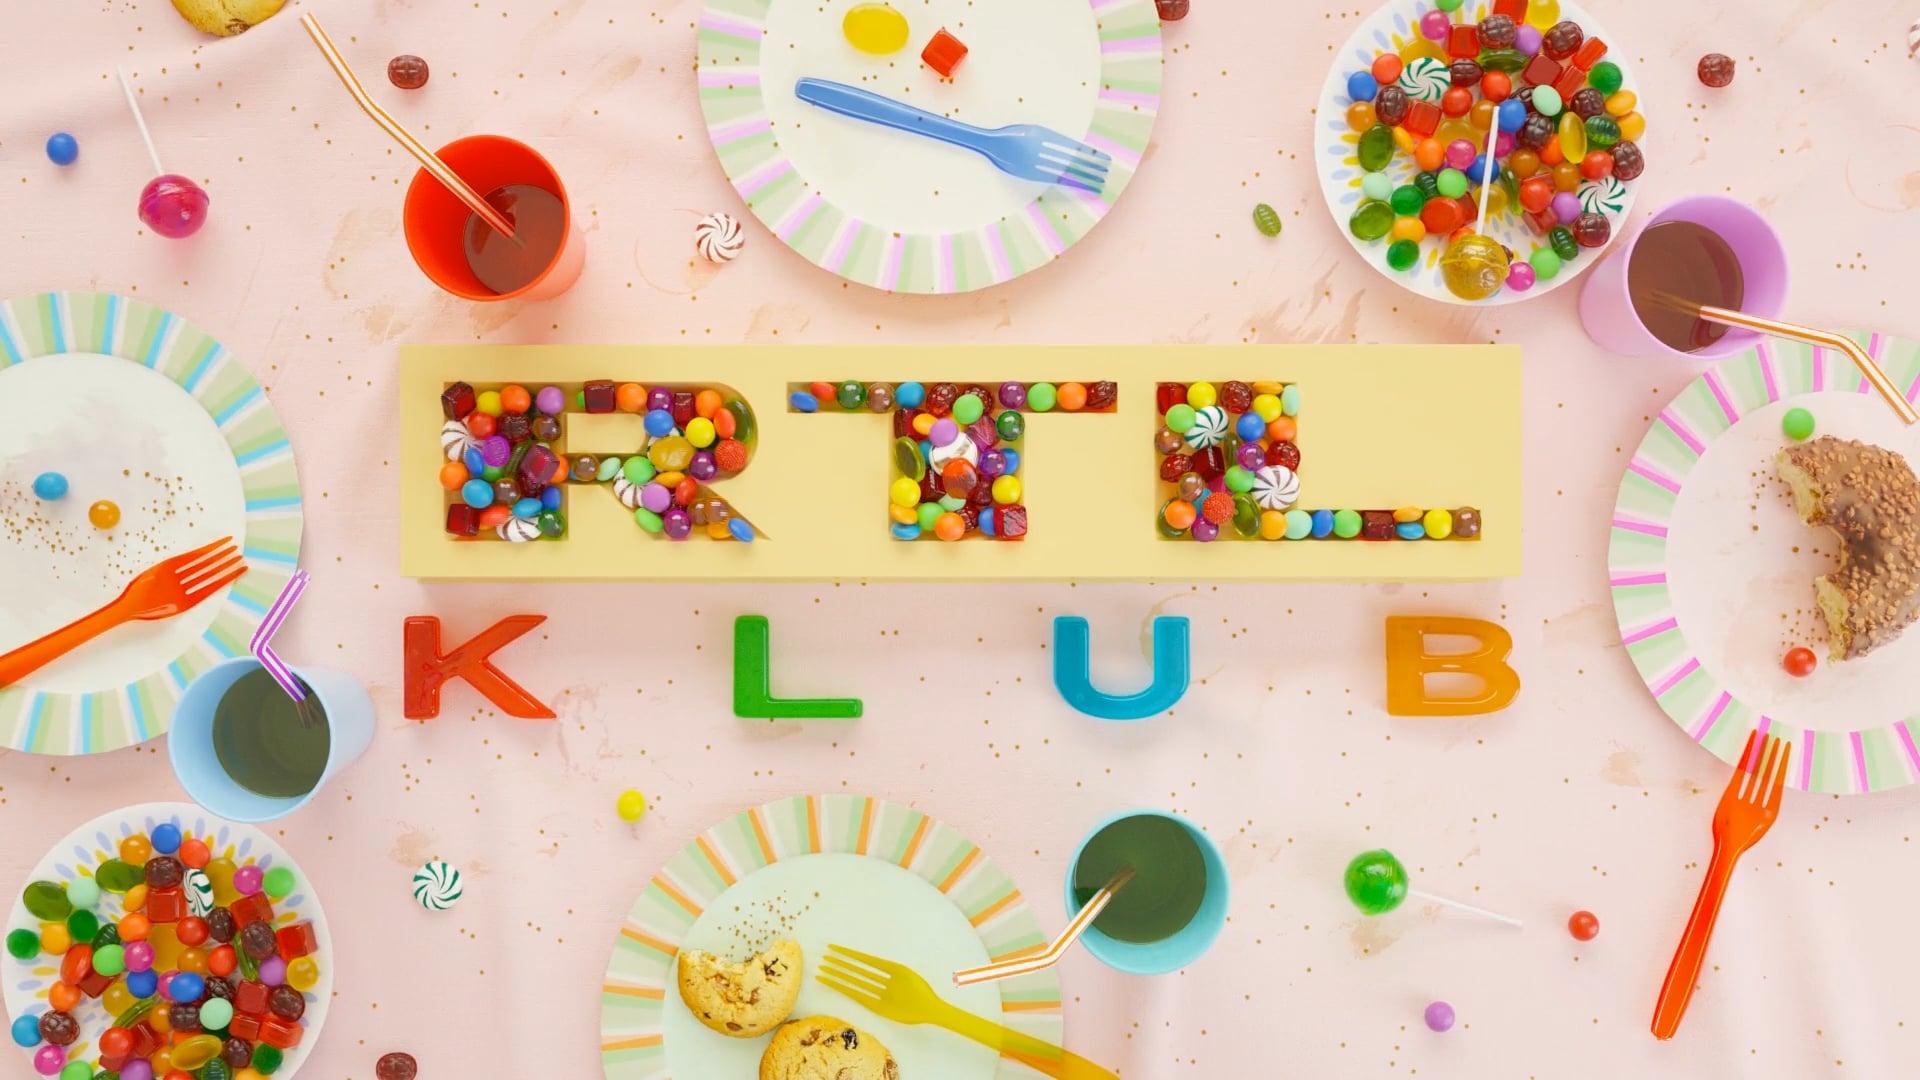 RTL Klub | channel branding 2018